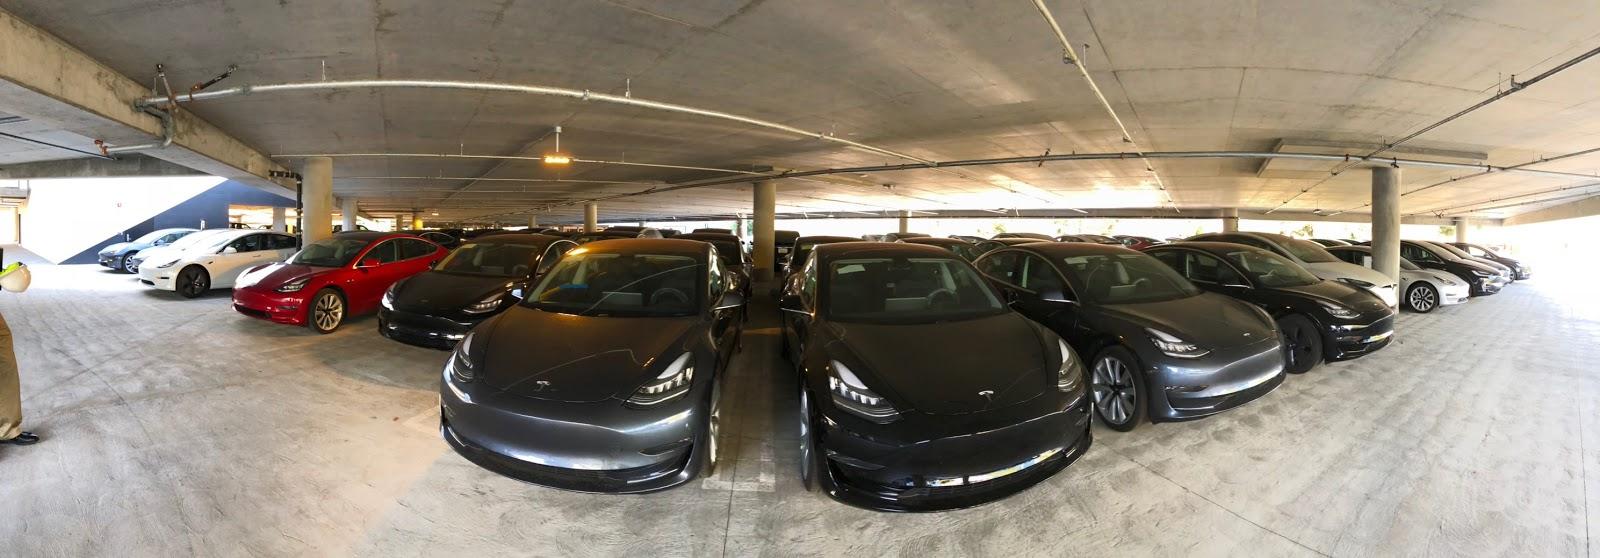 Tesla-LA-Parking-Lot-2